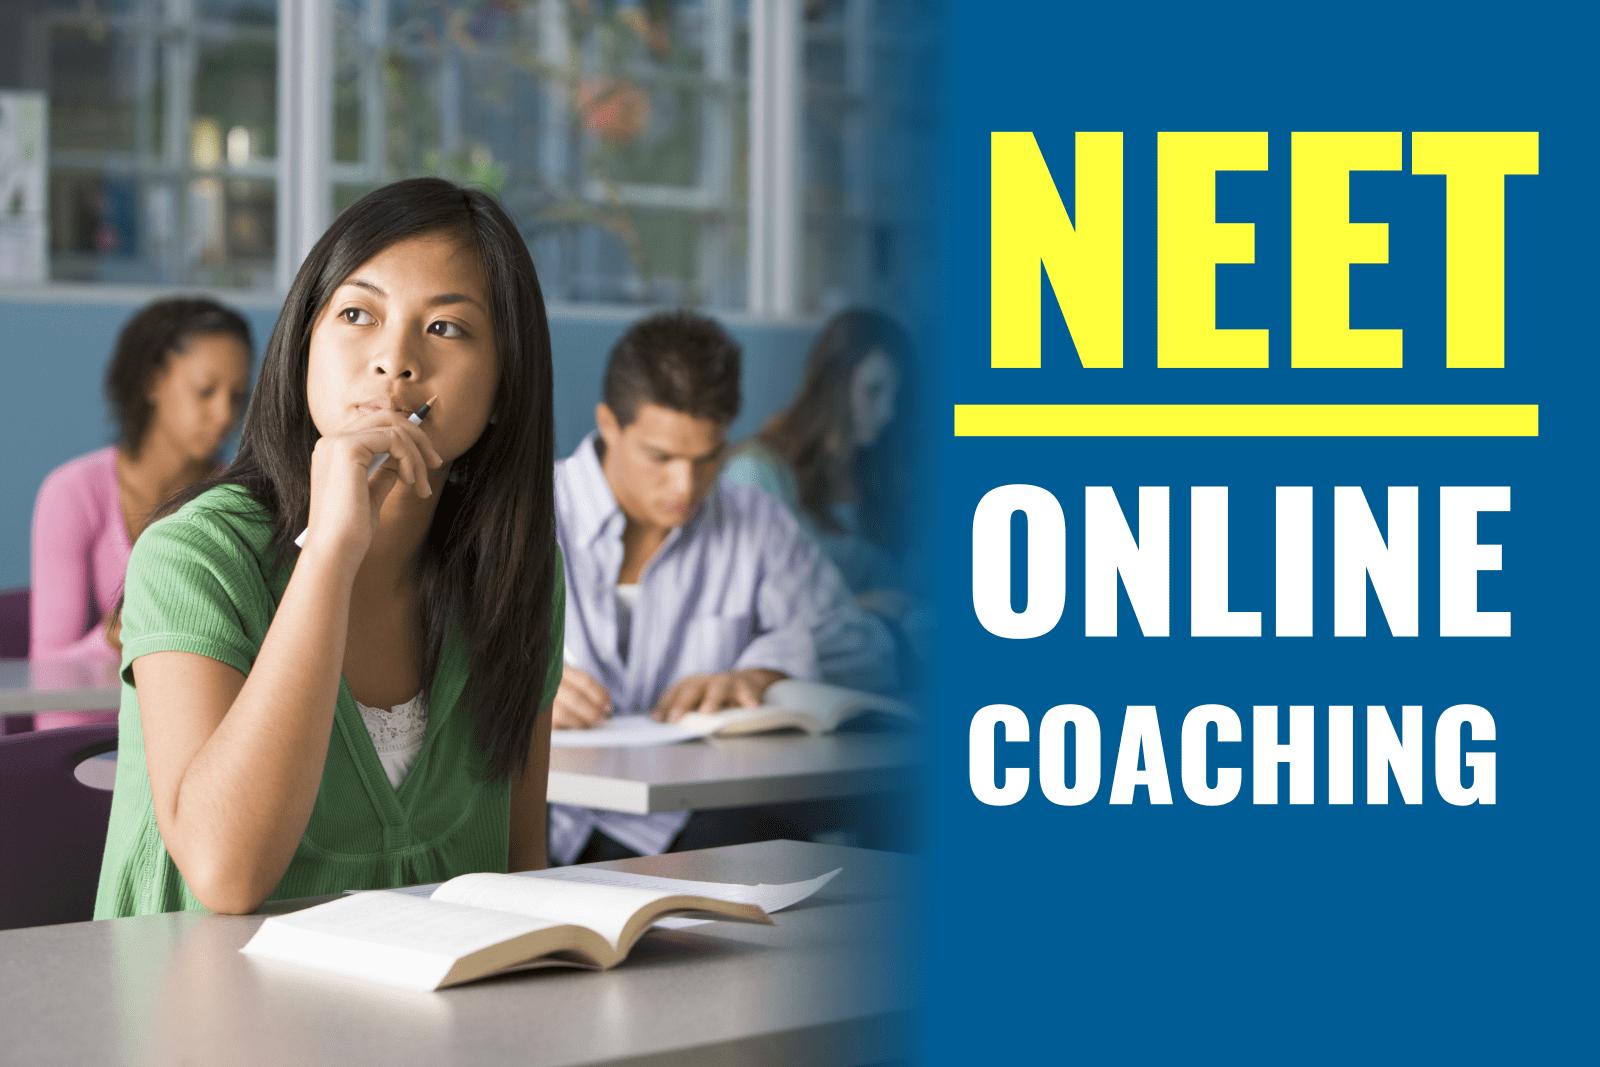 neet-online-coaching-featured-image